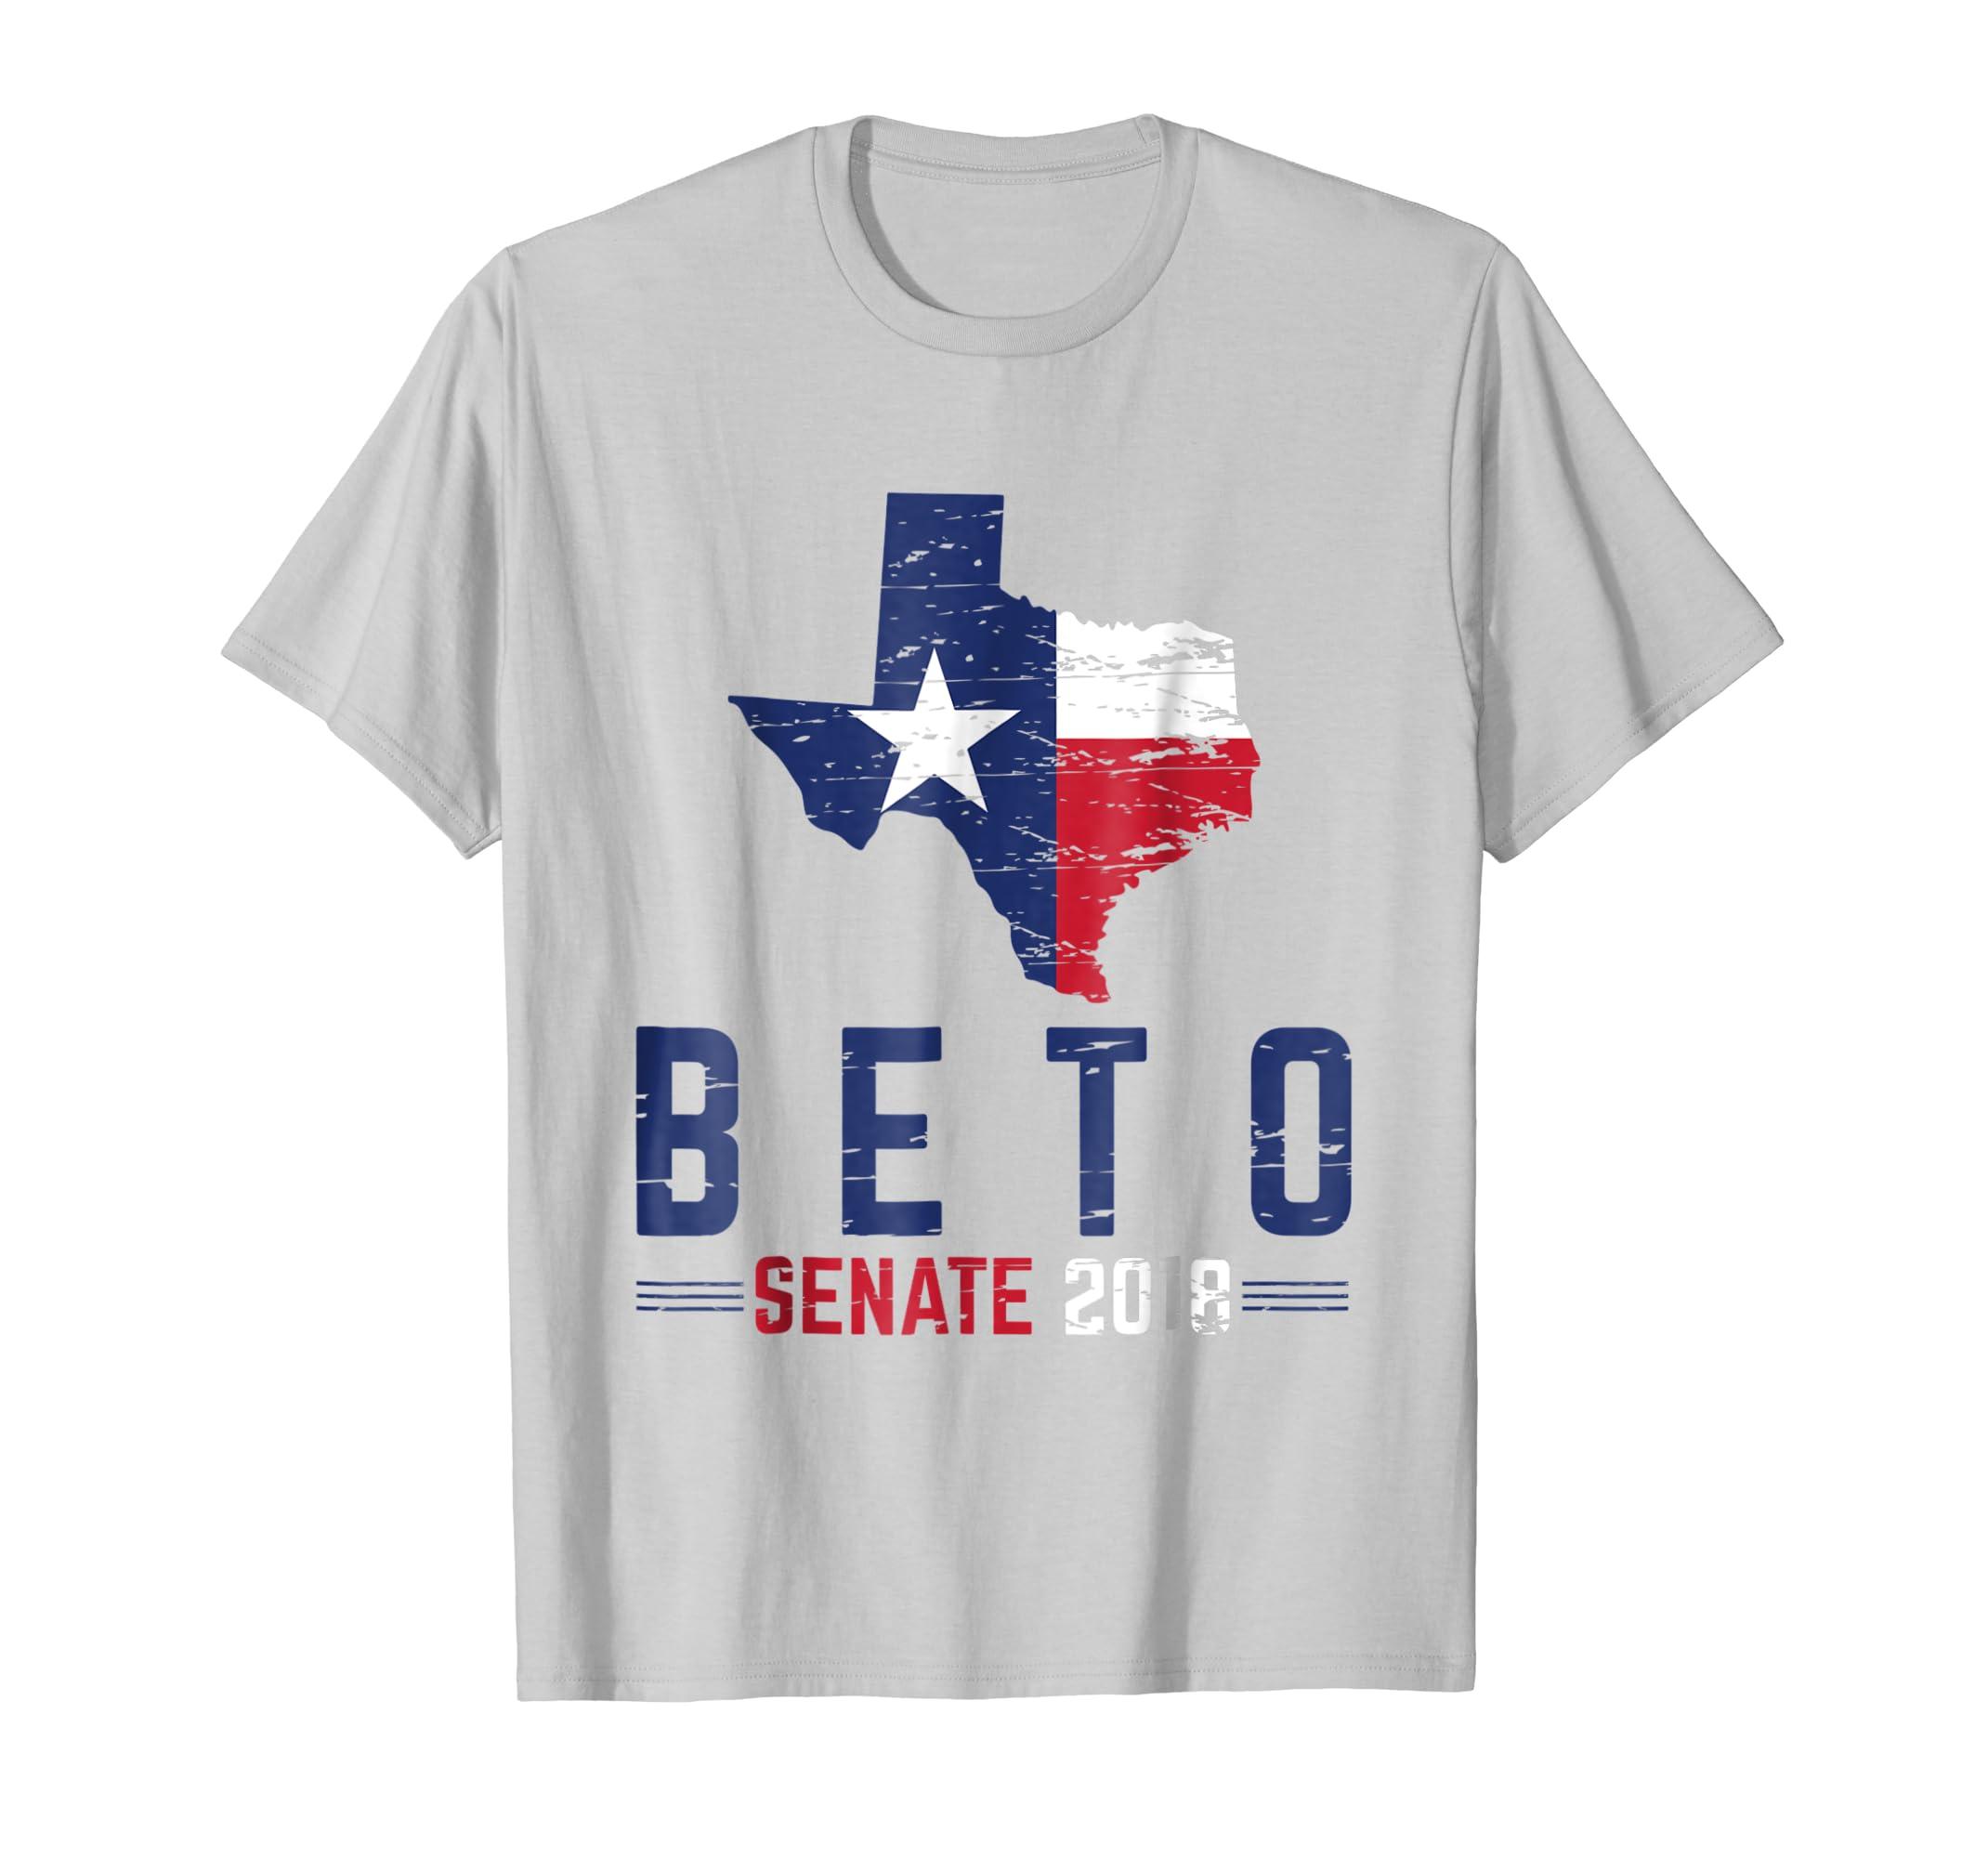 Vote Beto Orourke Texas Senate Midterm 2018 Women T Shirt-Awarplus